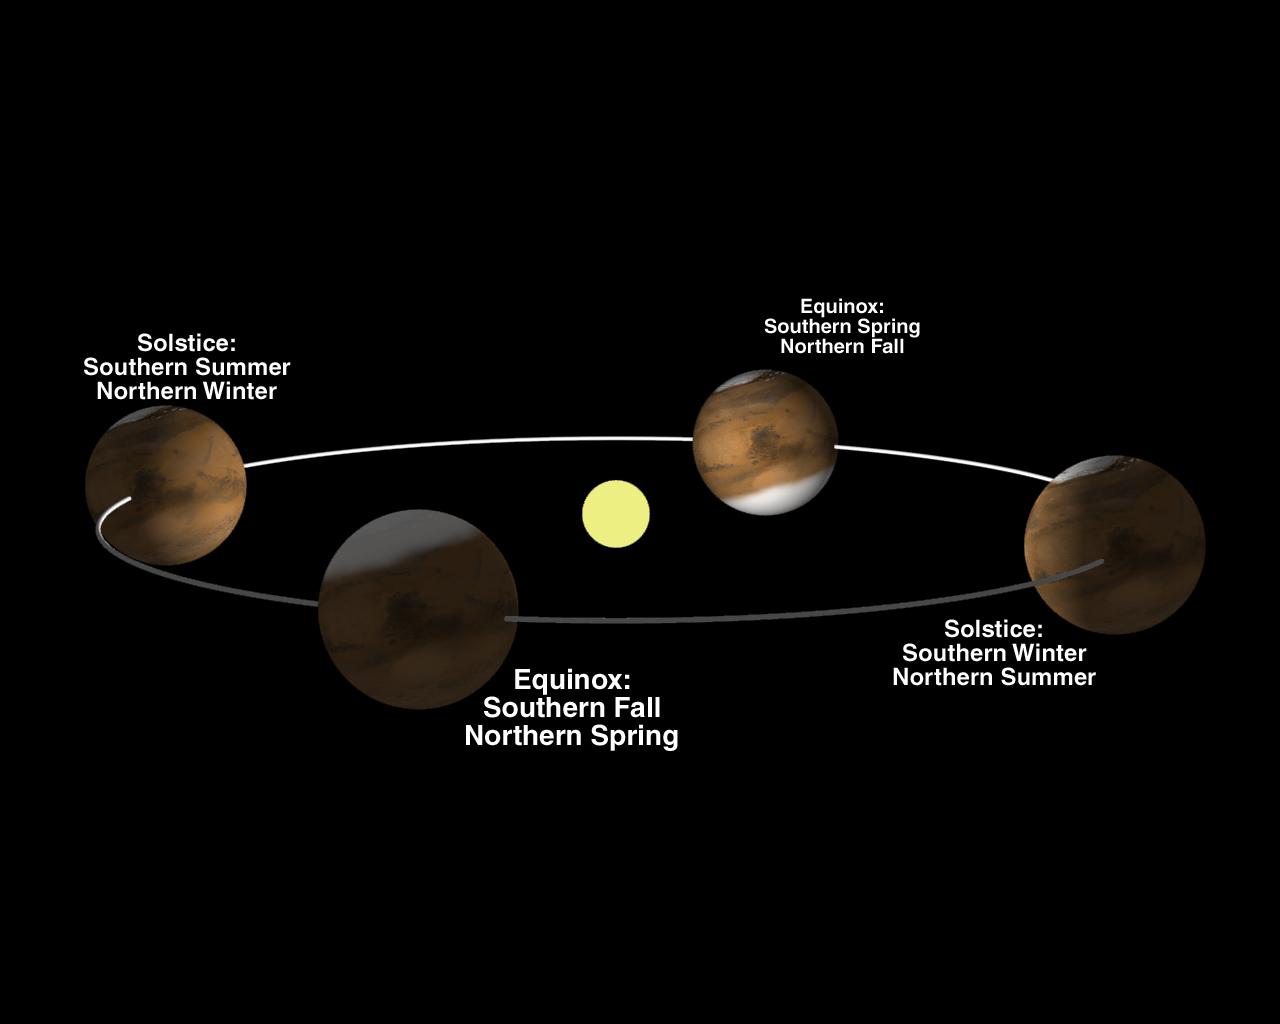 Mars Global Surveyor MOC2-285 Releasemars.nasa.gov